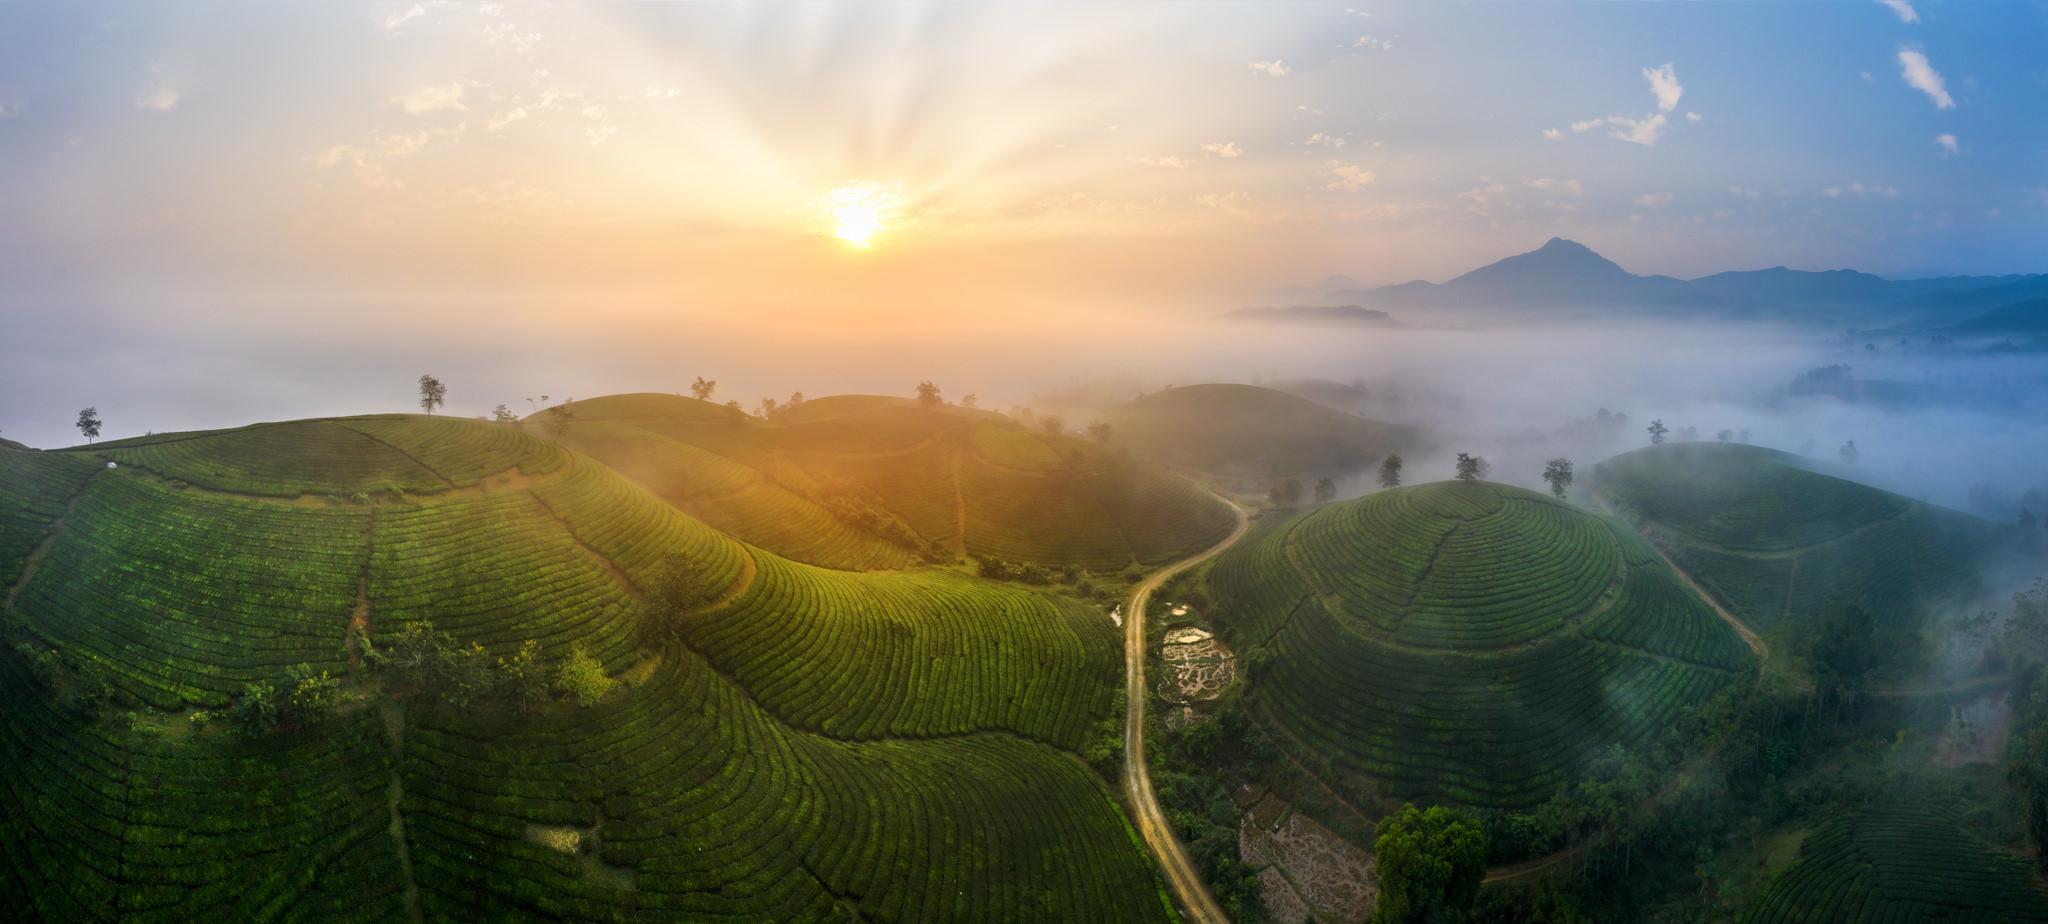 du lịch Phú Thọ 20